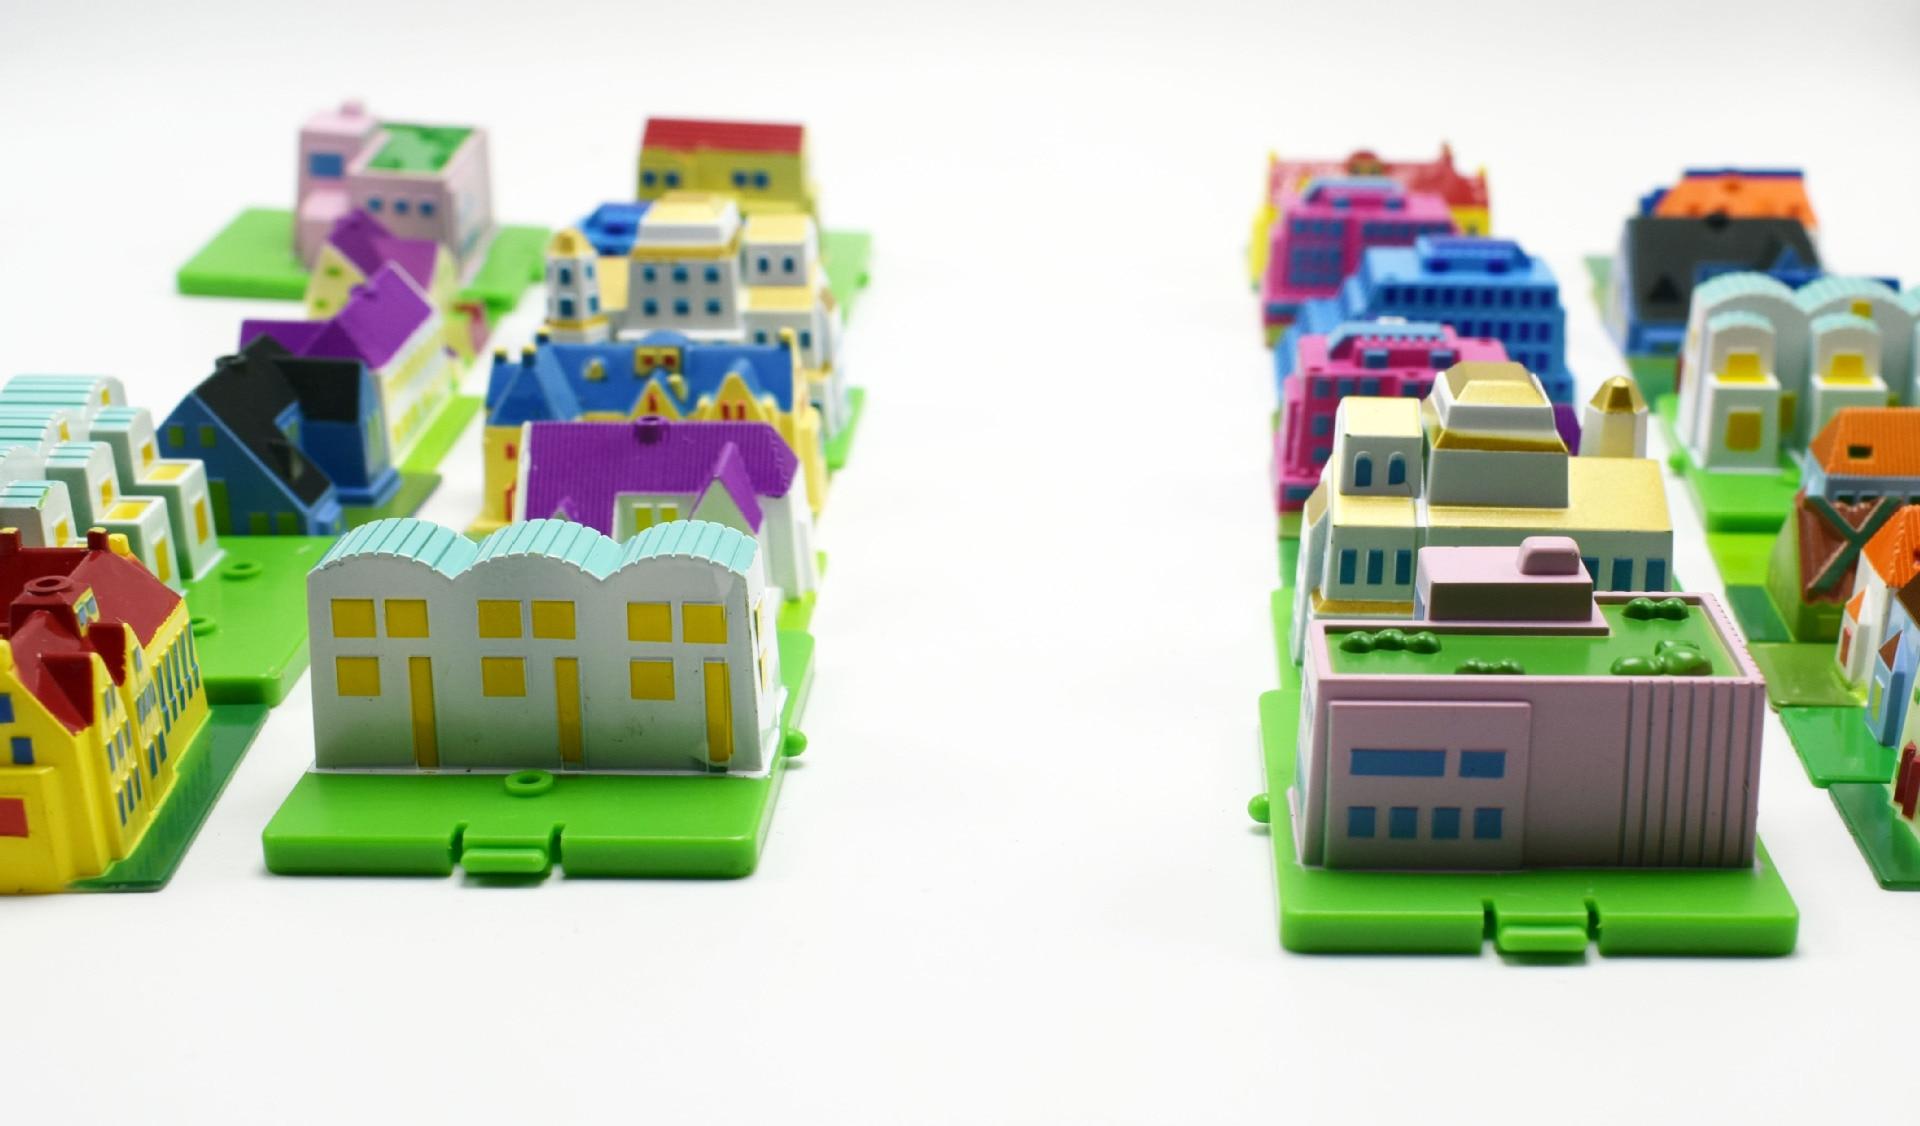 Wilscoil 5pcs Set Random New Plastic Small House Model Building